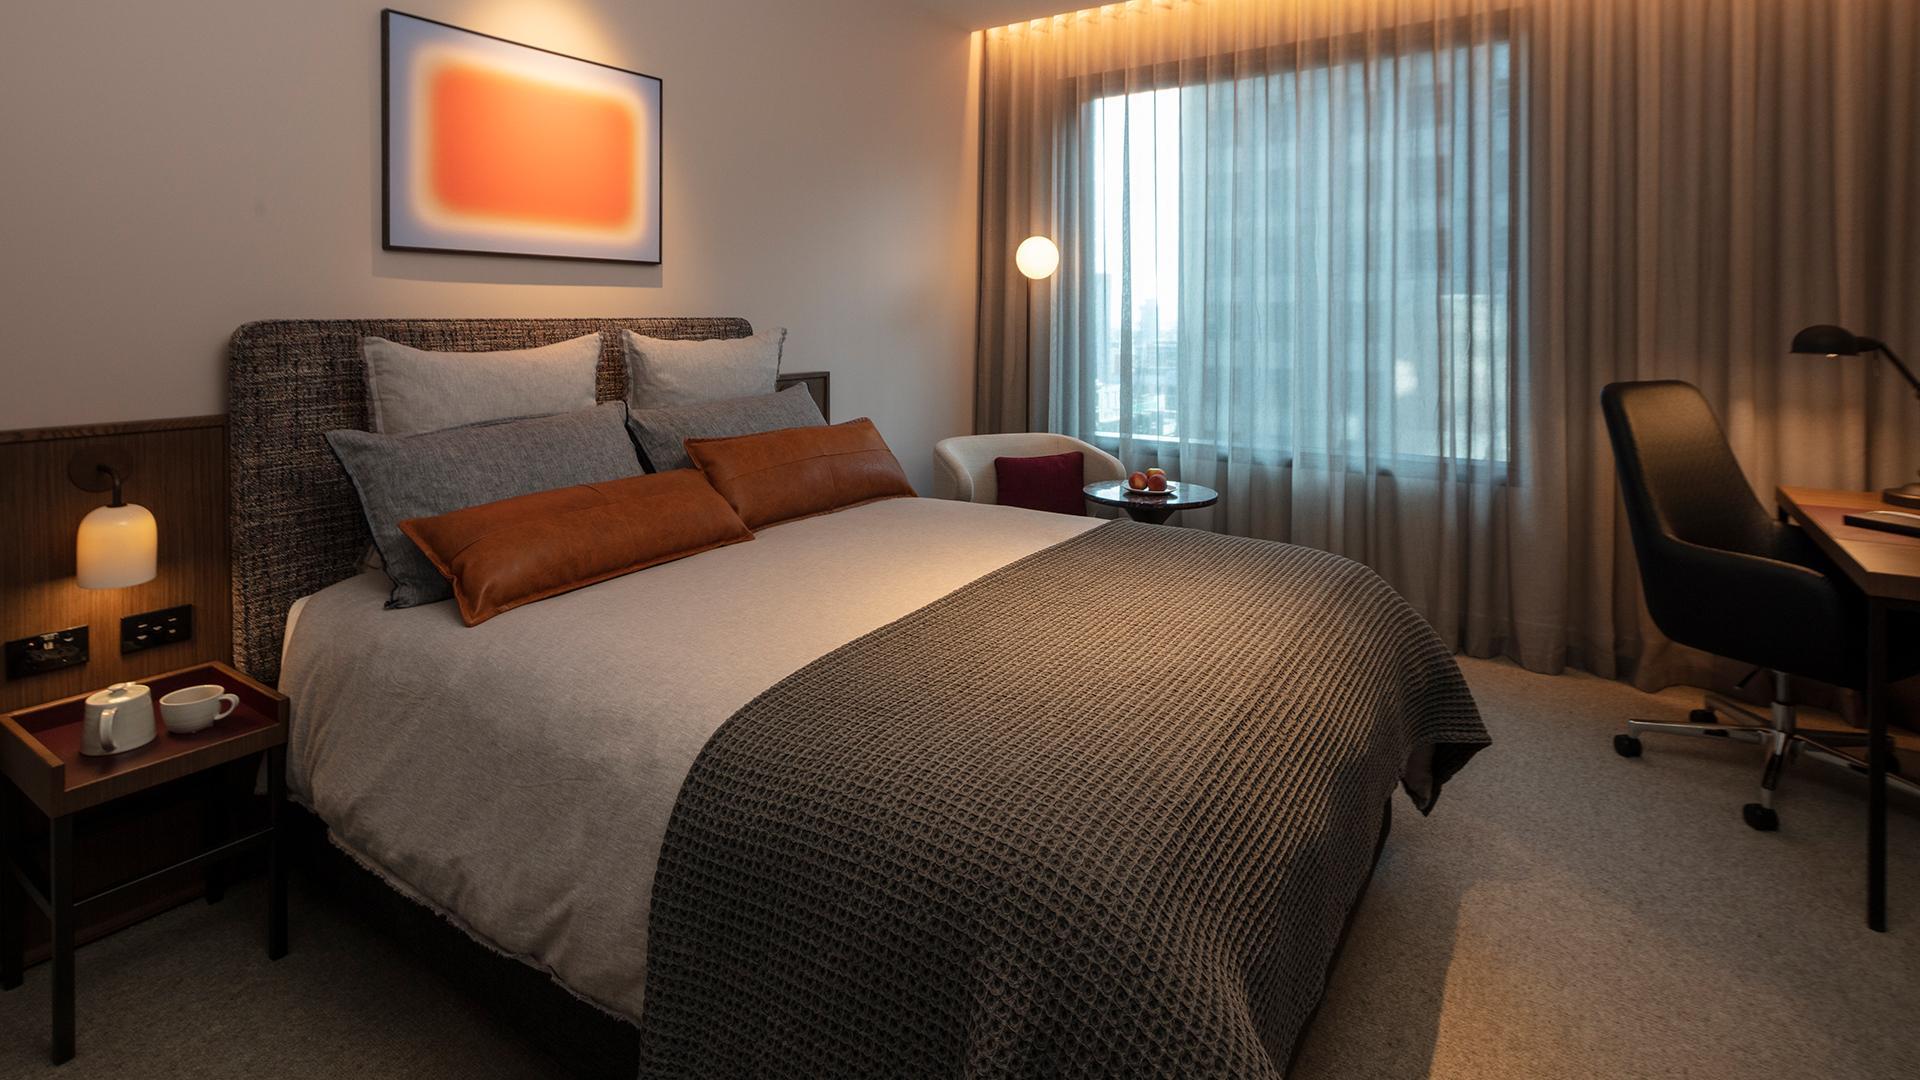 Next Level King Room image 1 at Next Hotel Melbourne by Melbourne City, Victoria, Australia